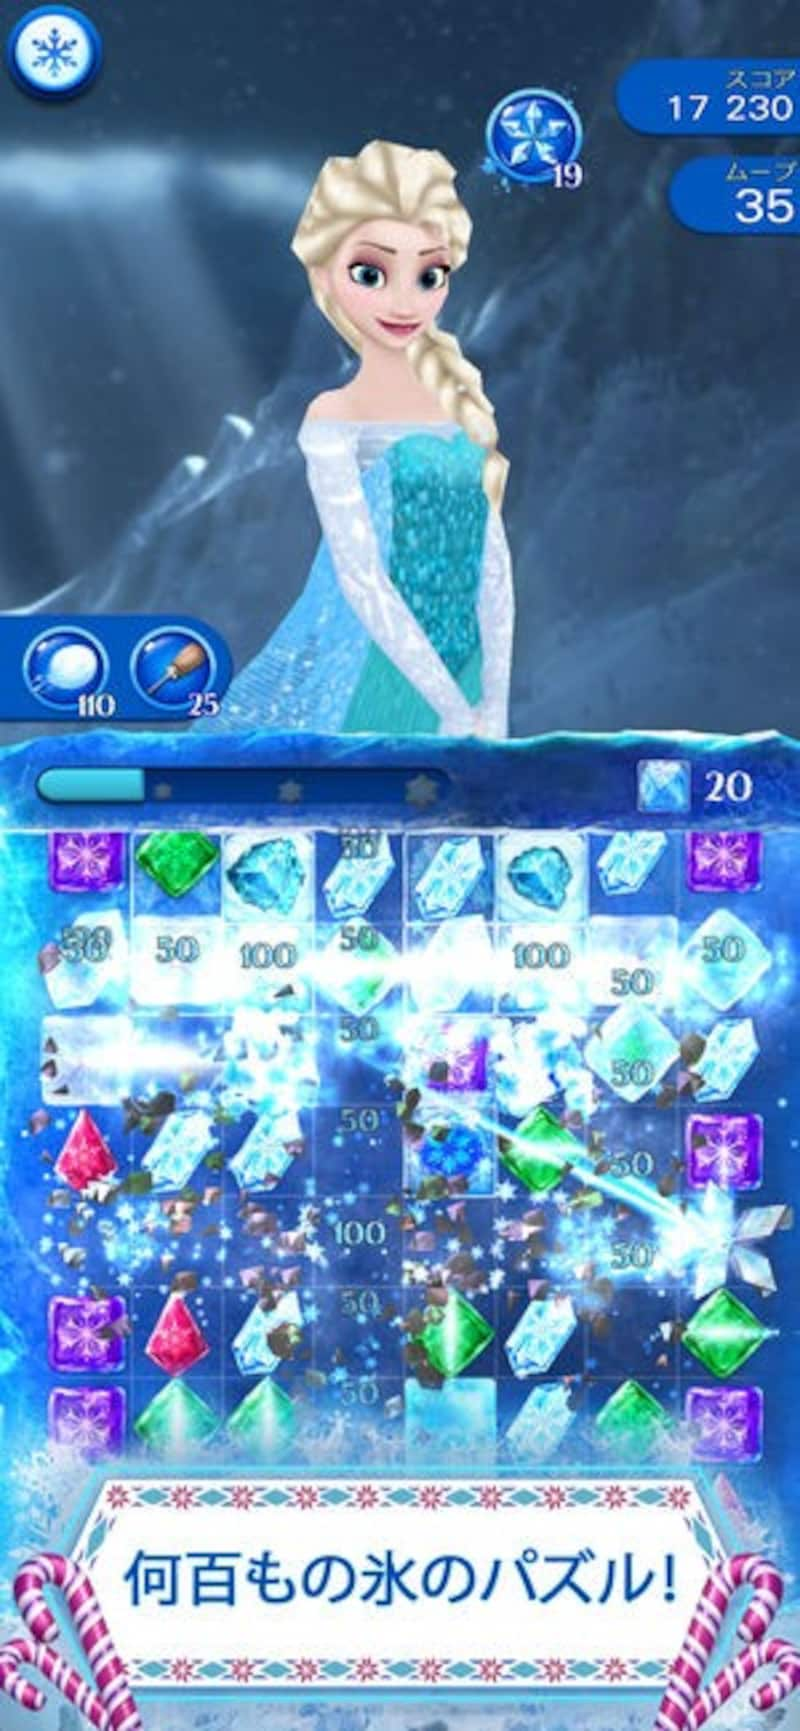 Disney(ディズニー),アナと雪の女王: Free Fall